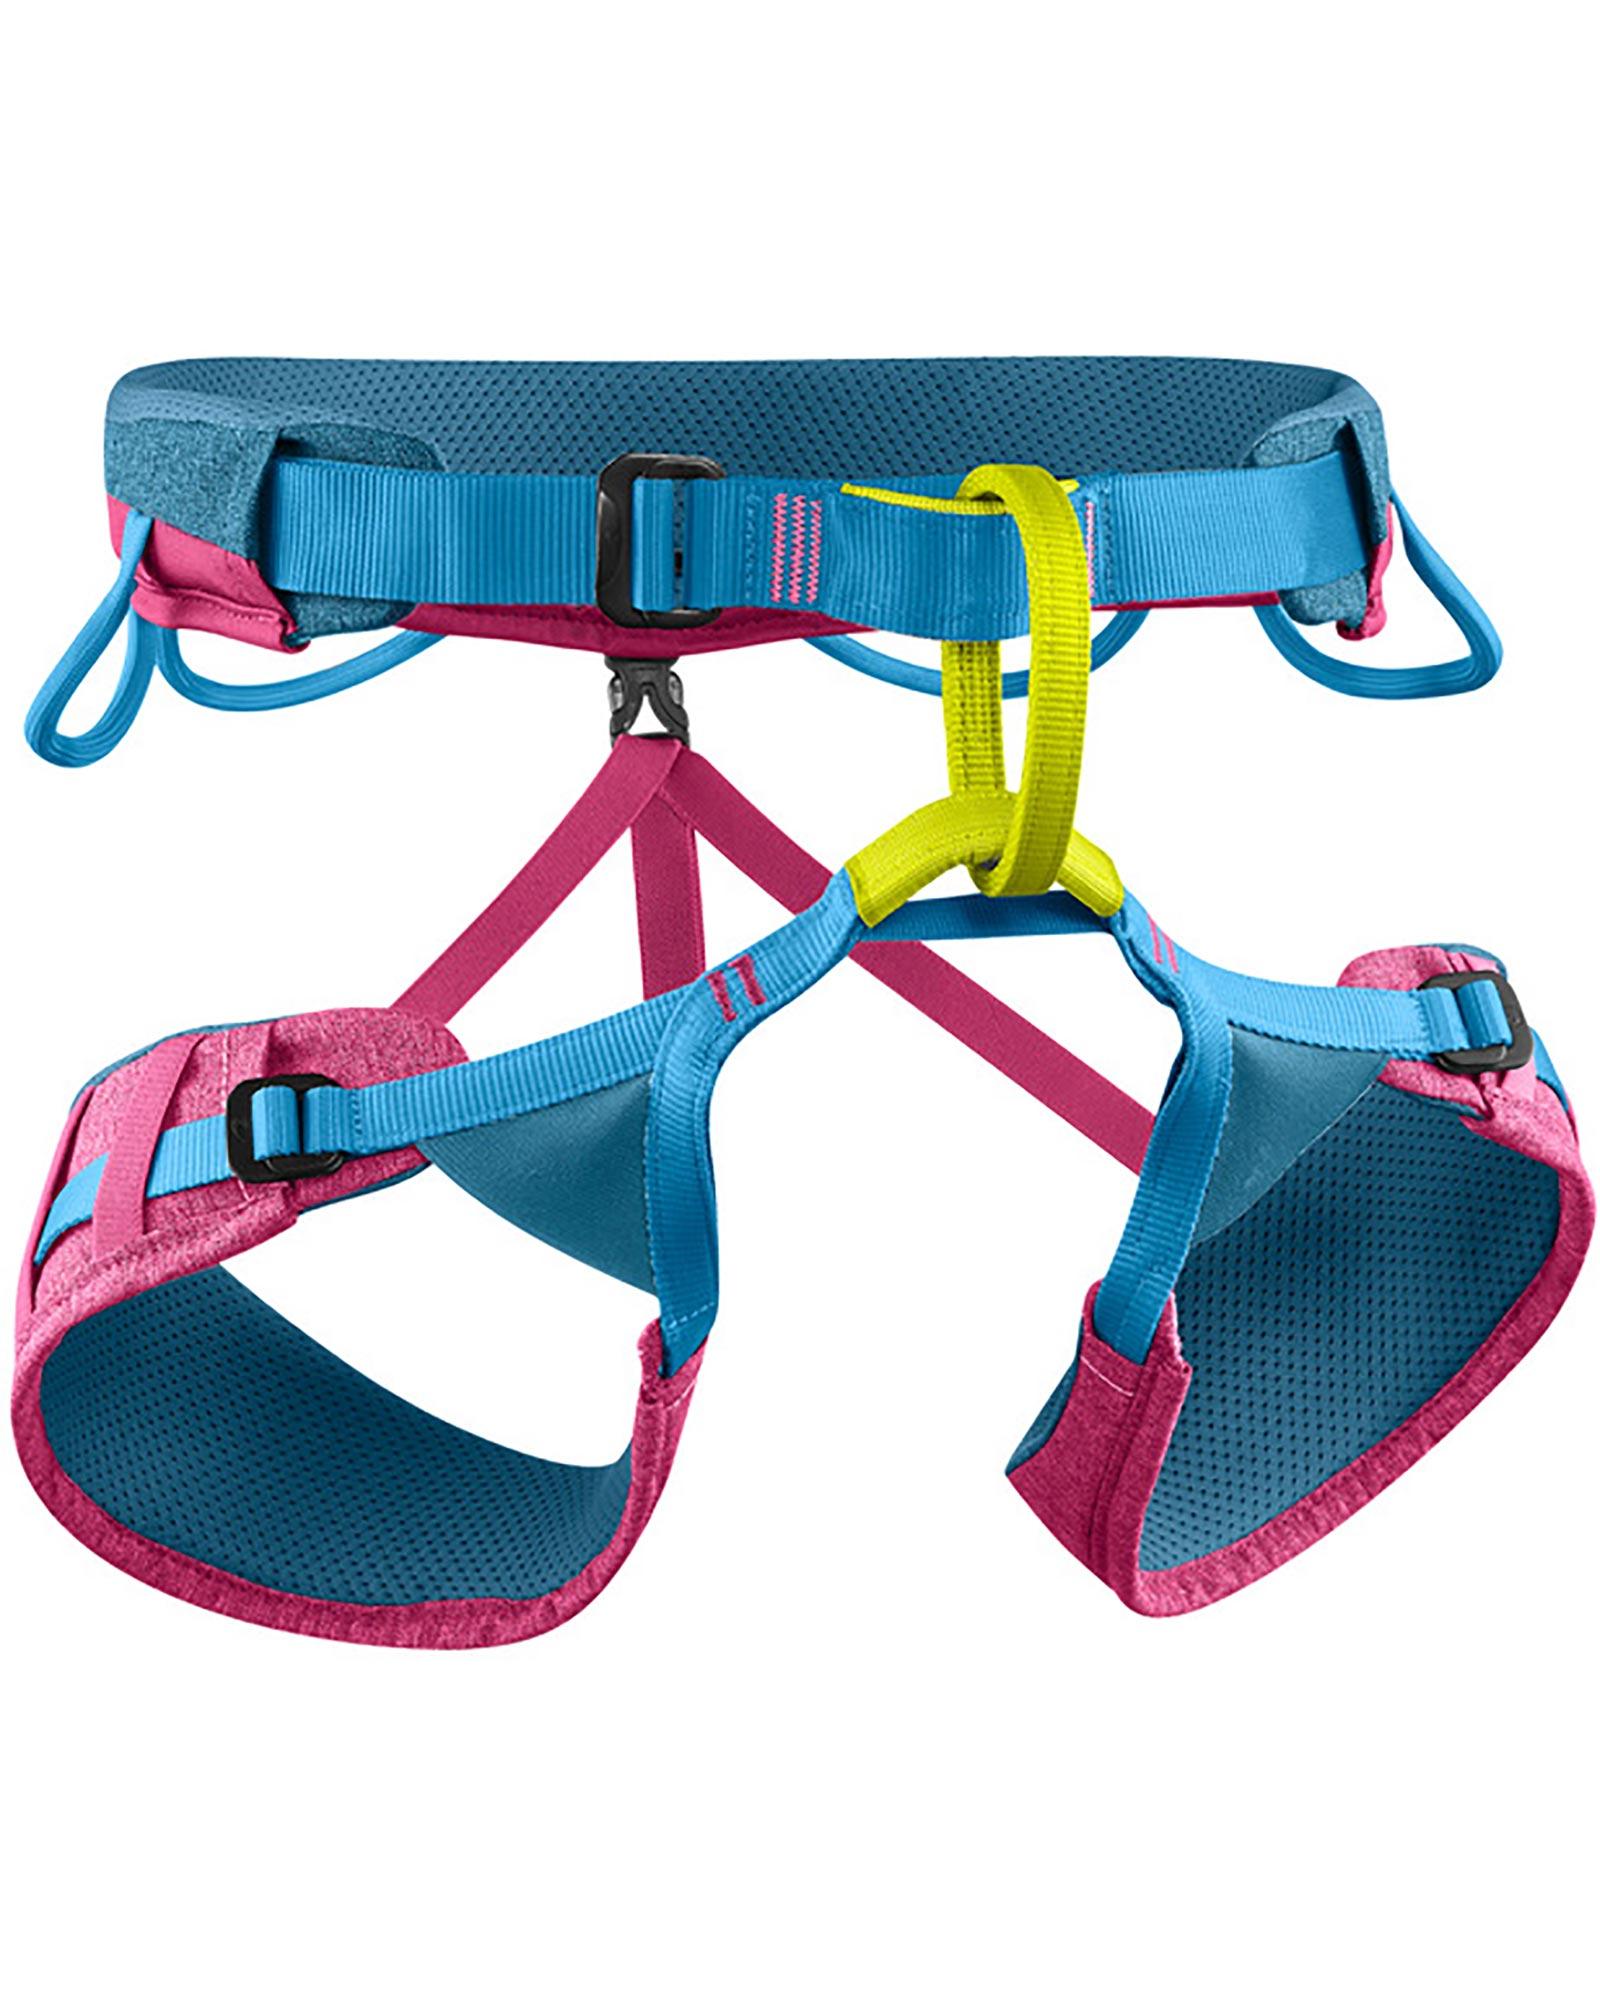 Edelrid Women's Jayne Climbing Harness 0